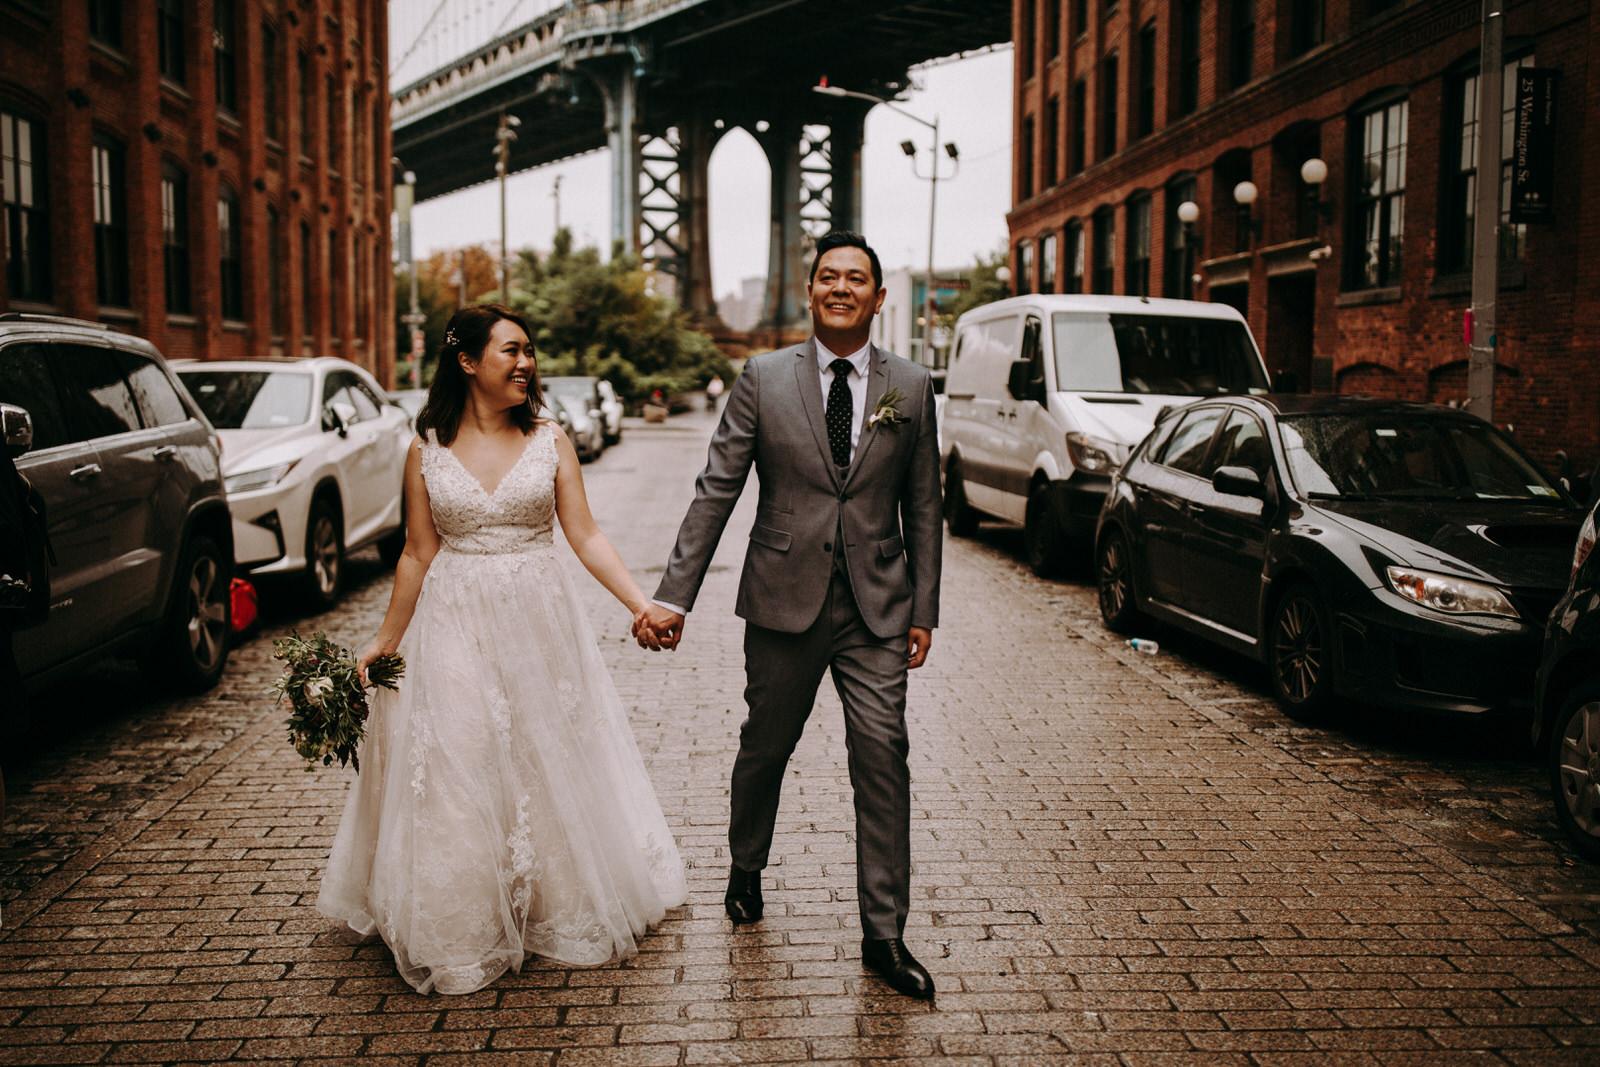 The wedding couple is walking underneath the Brooklyn Bridge.